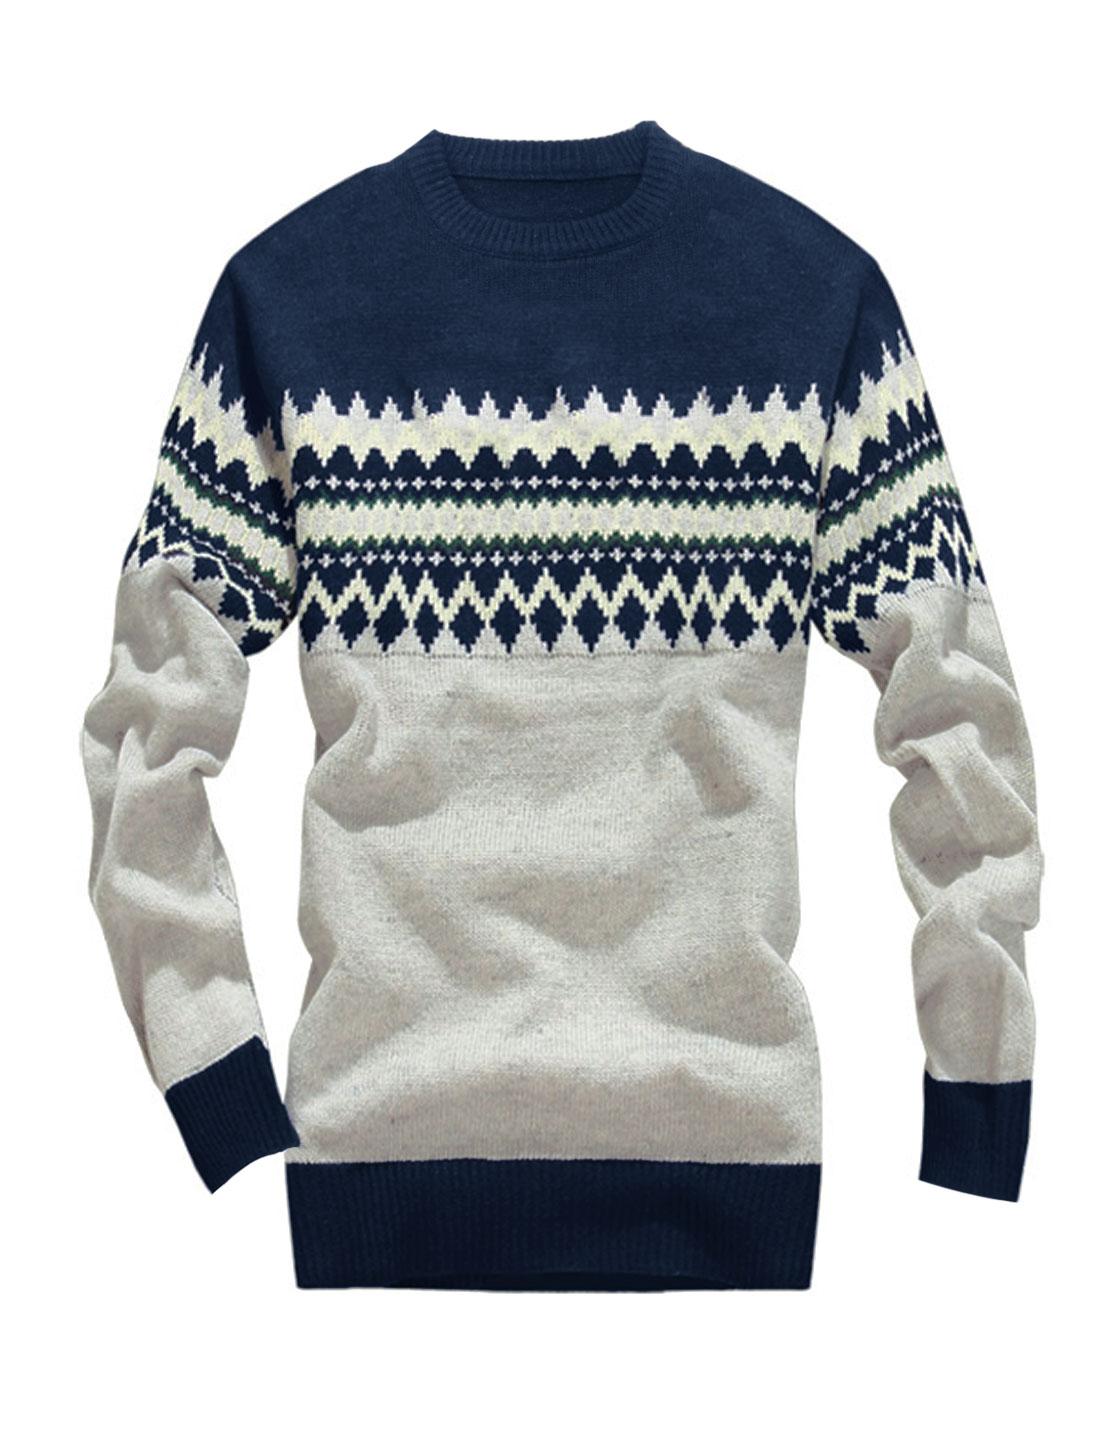 Men Long Sleeves Argyle Pattern Zigzag Pattern Sweater Light Gray Navy Blue S